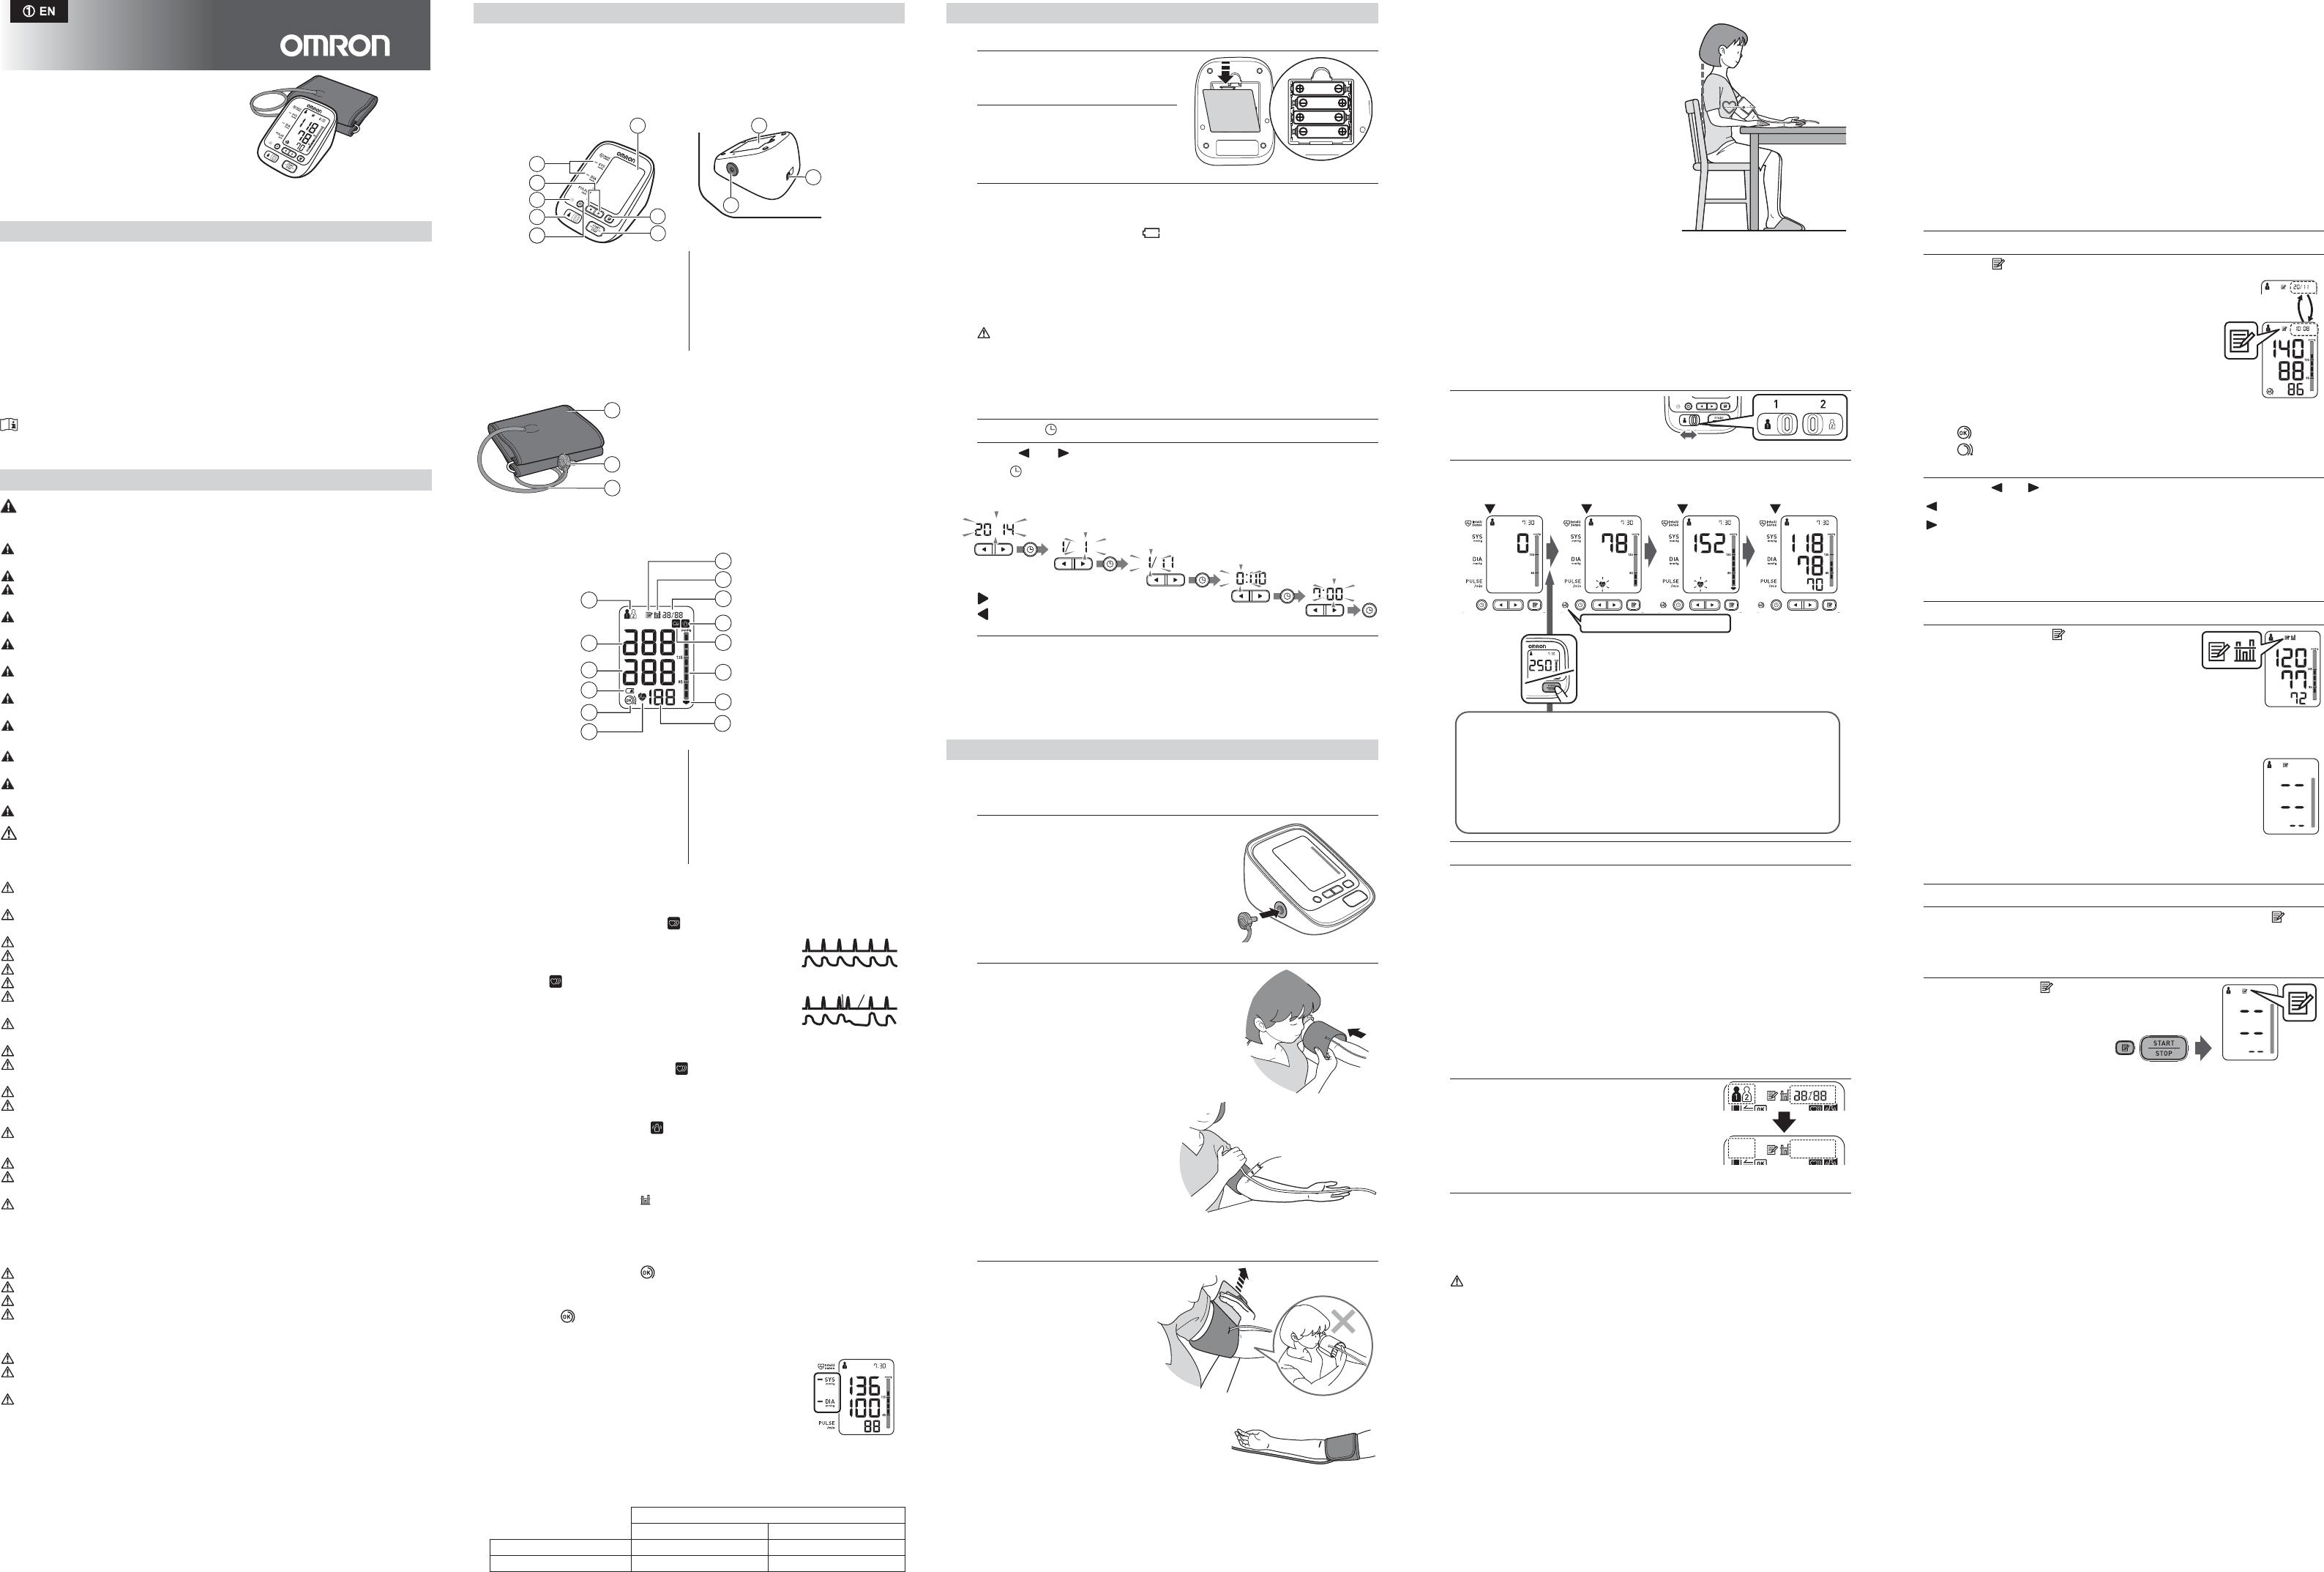 Handleiding Omron M3 Hem 7131 E Pagina 2 Van 2 English